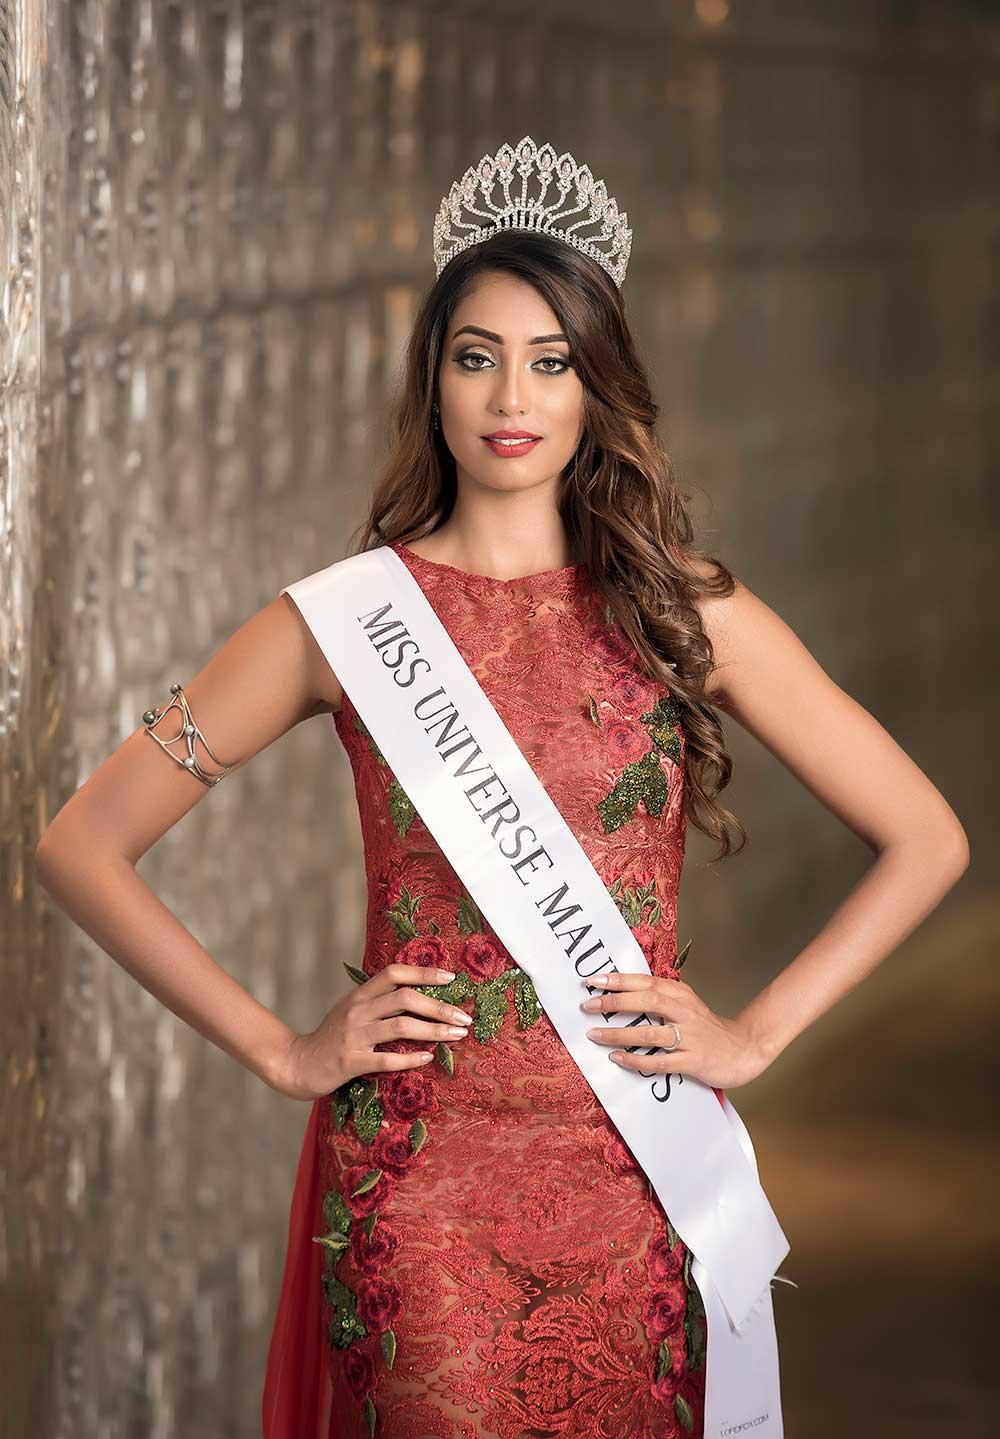 miss-universe-mauritius-2017-estrella-angie5.jpg